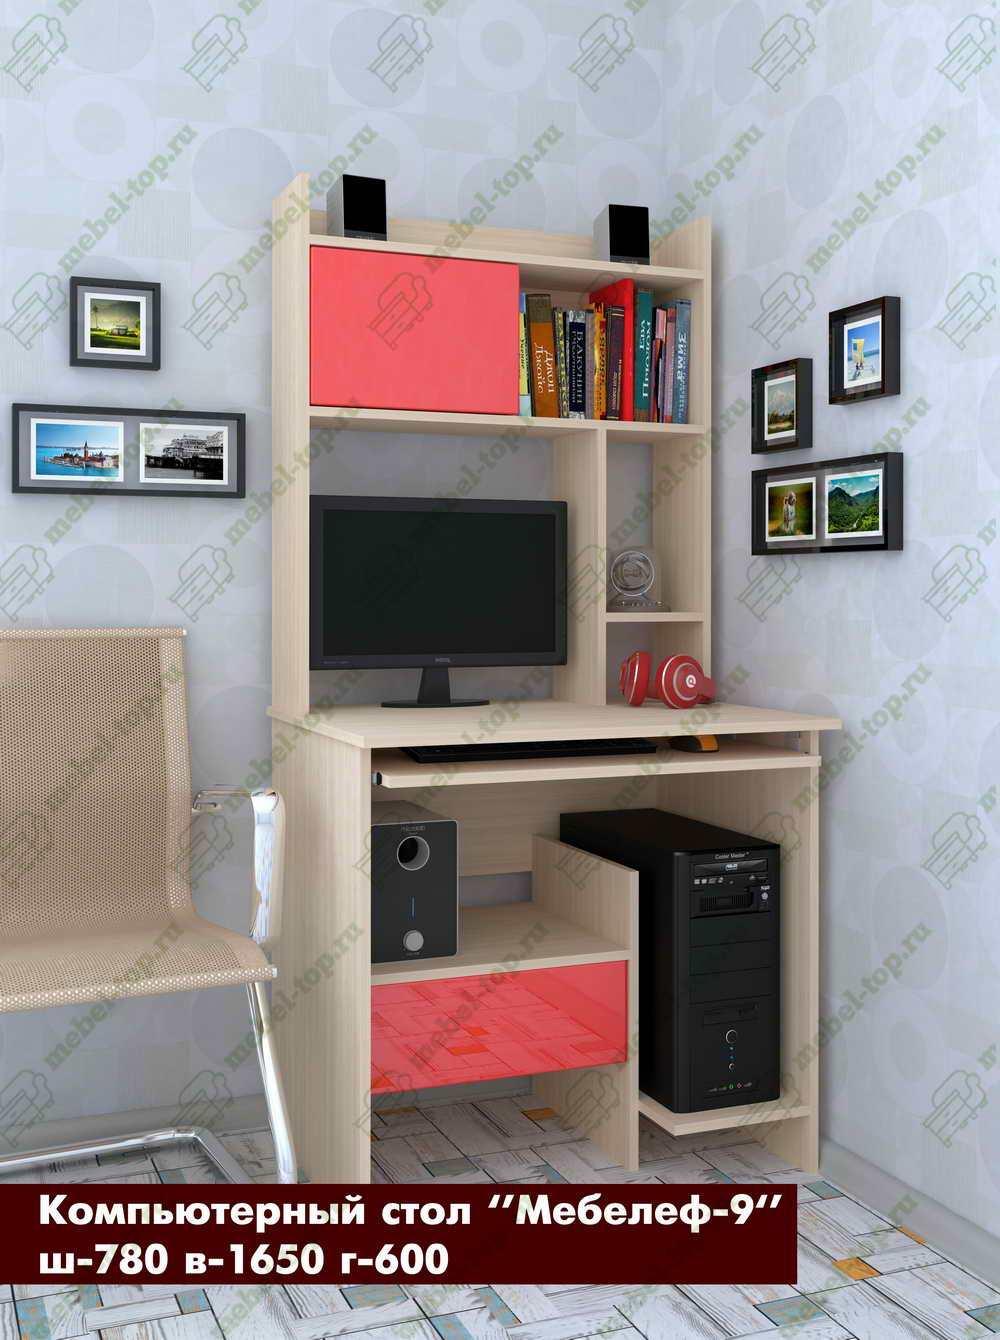 Компьютерный стол Мебелеф-9 стенка мебелеф 5